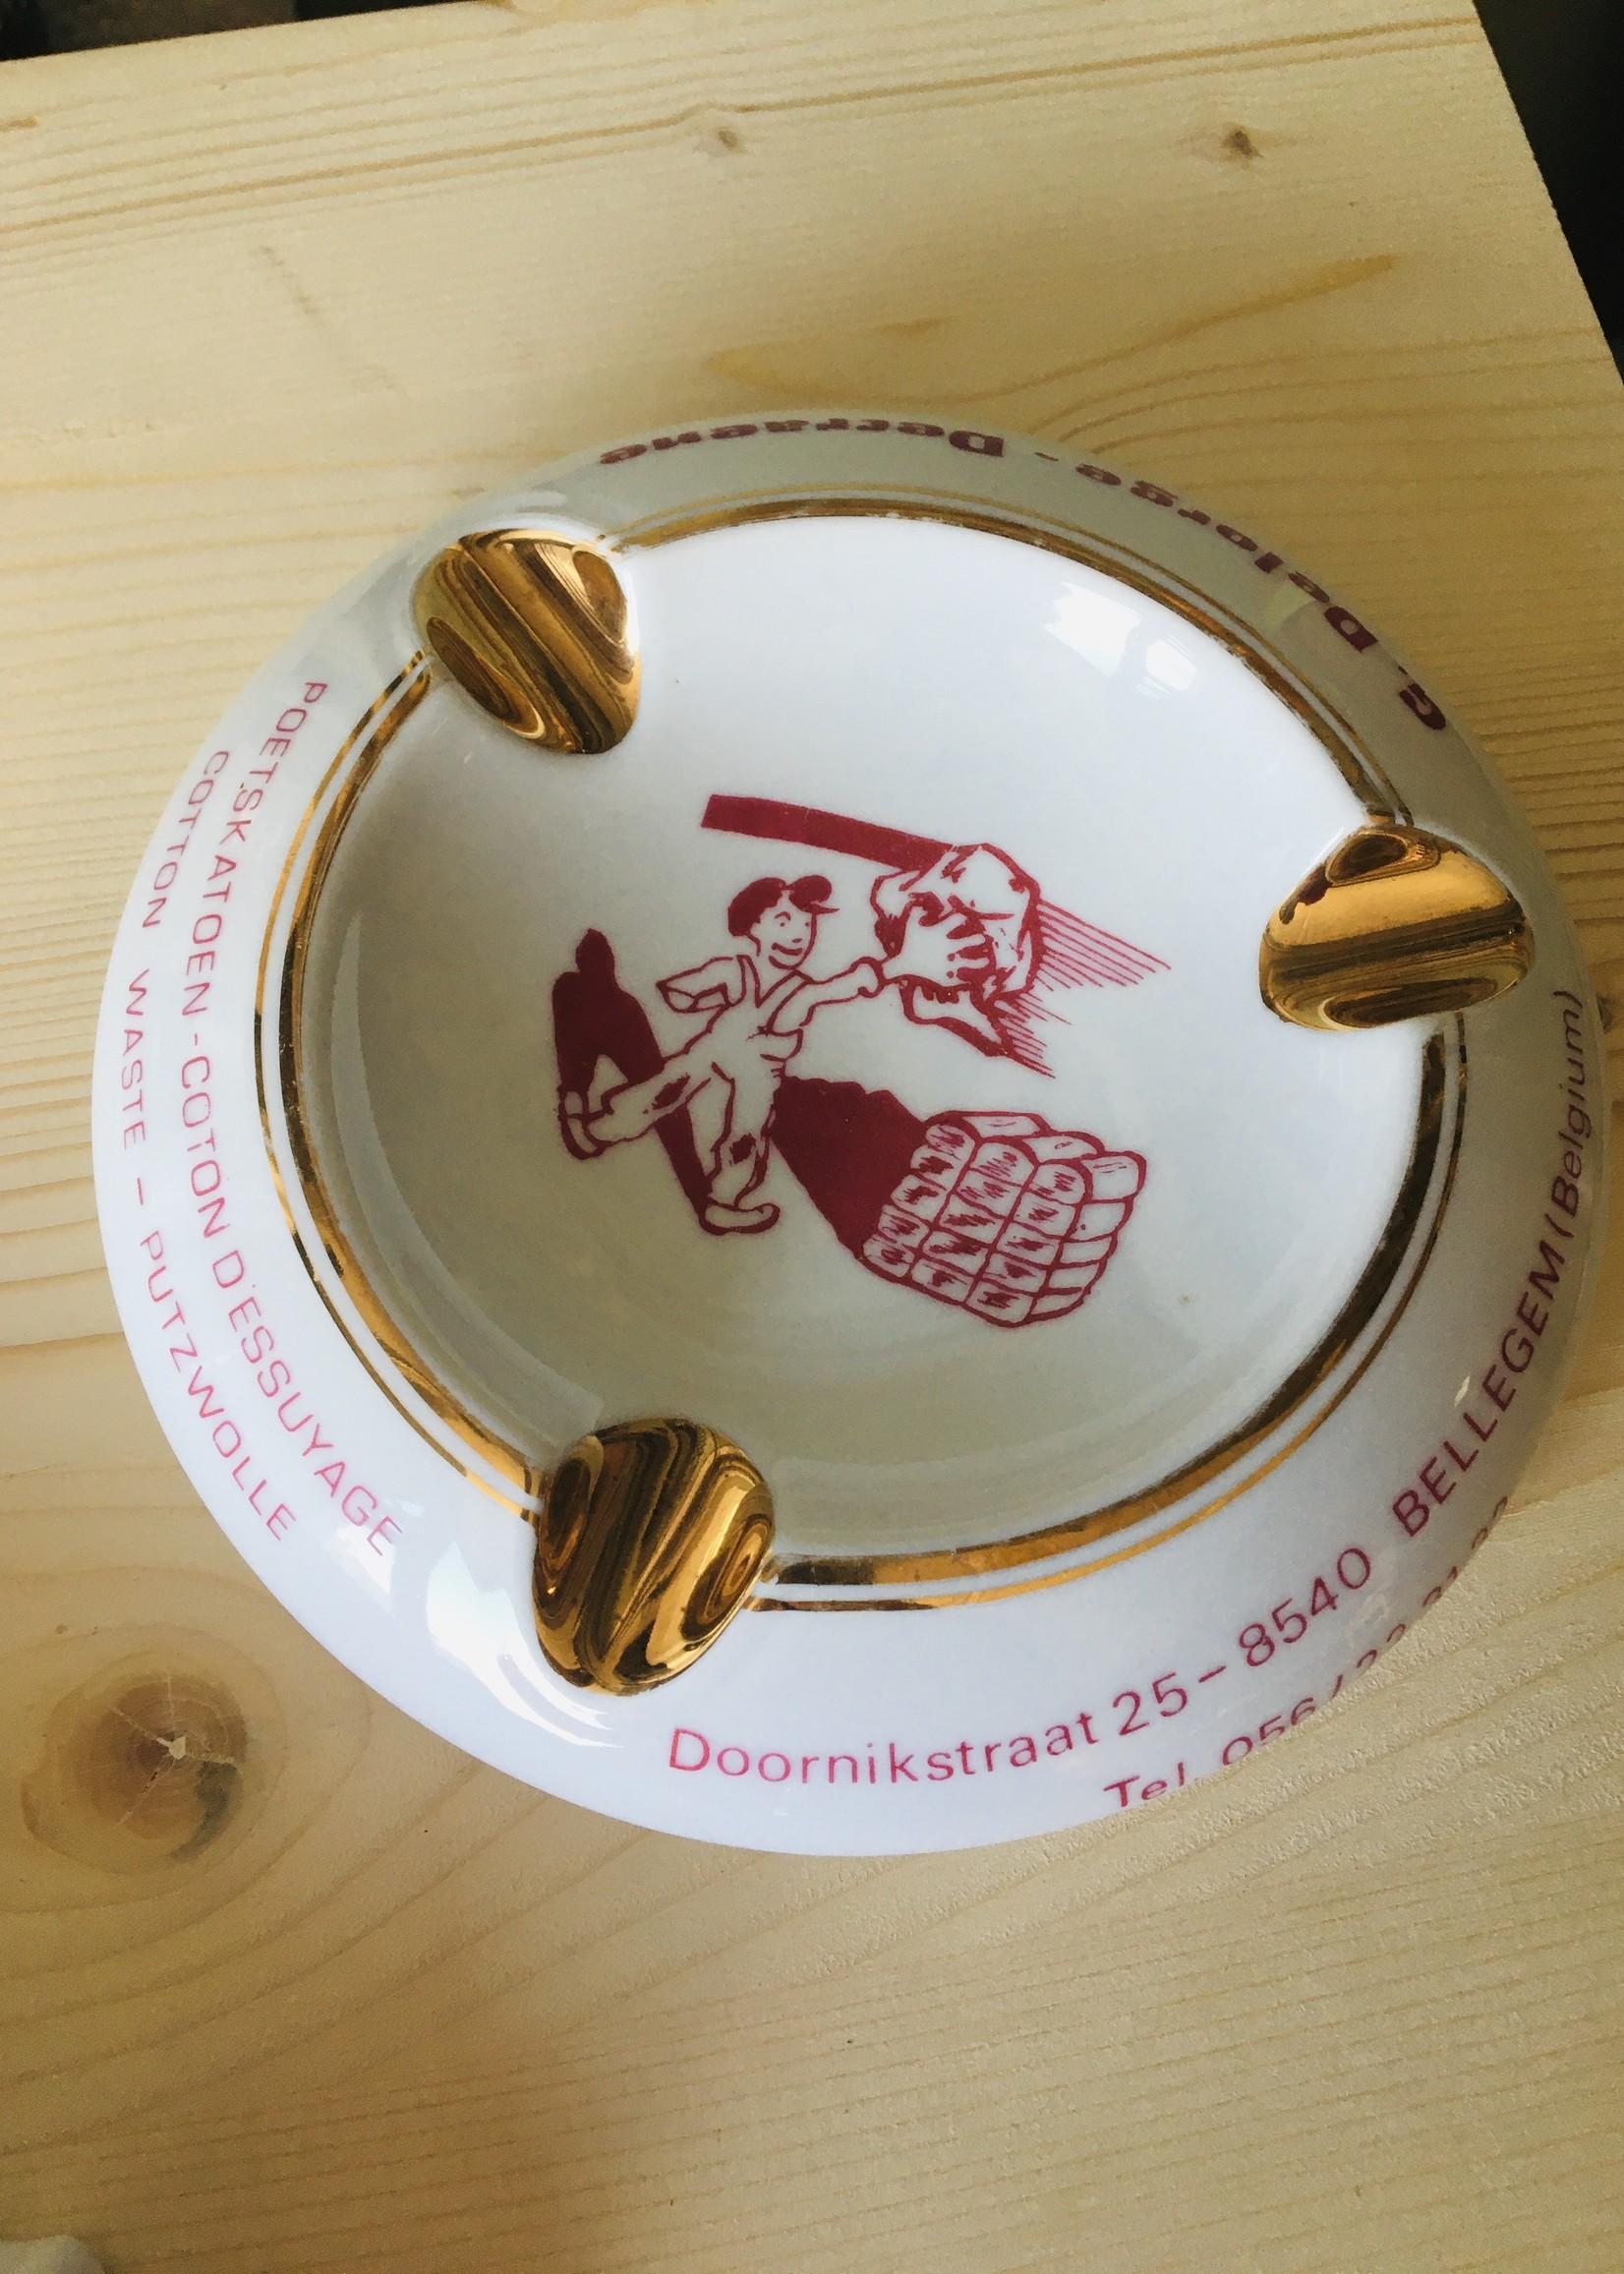 Ceramic ashtray Decraene with gold and red design